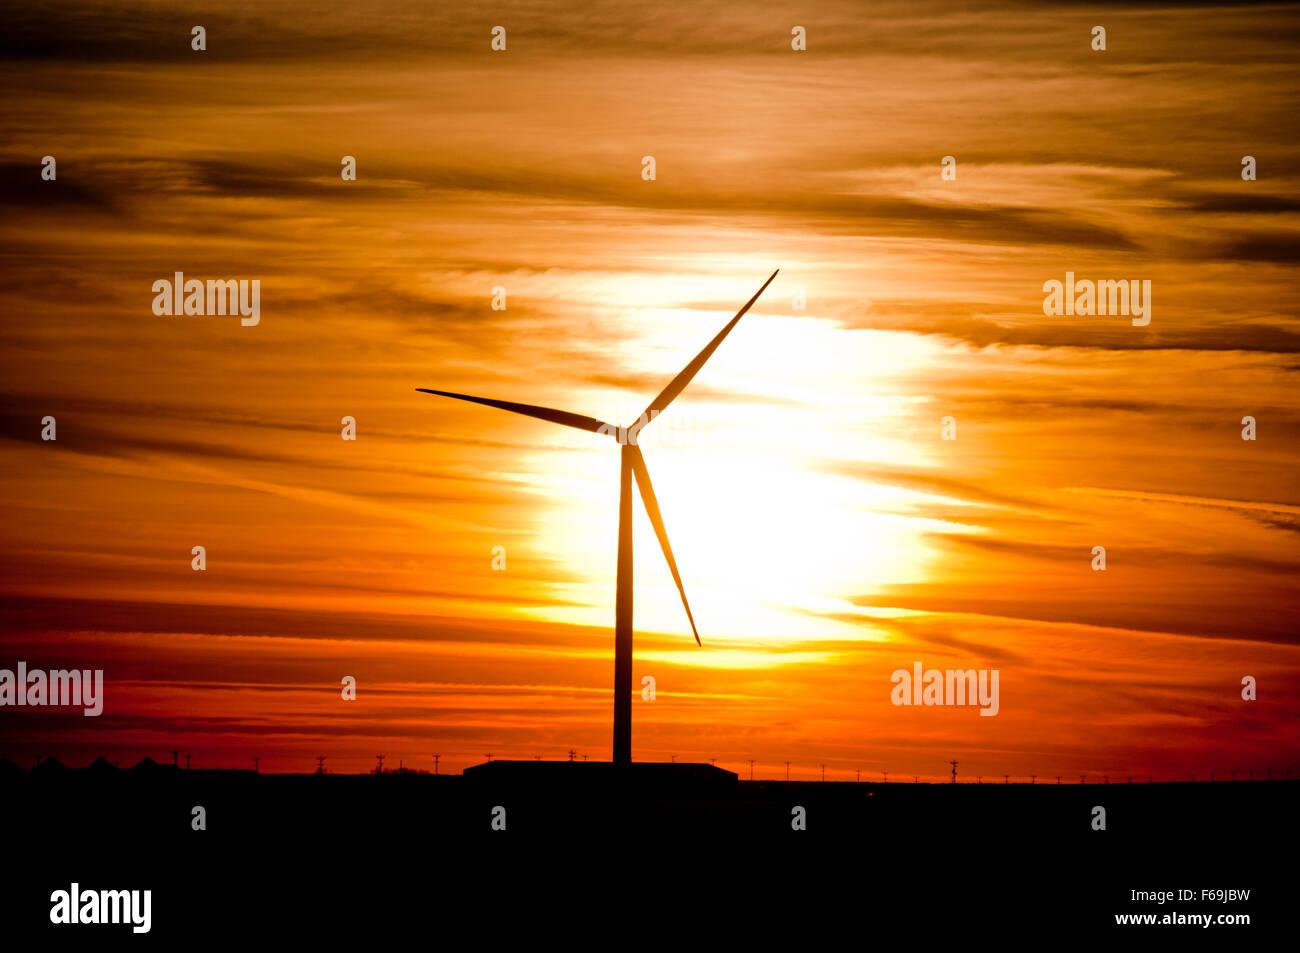 Windgenerator bei Sonnenuntergang in Elmore County, ID Stockbild